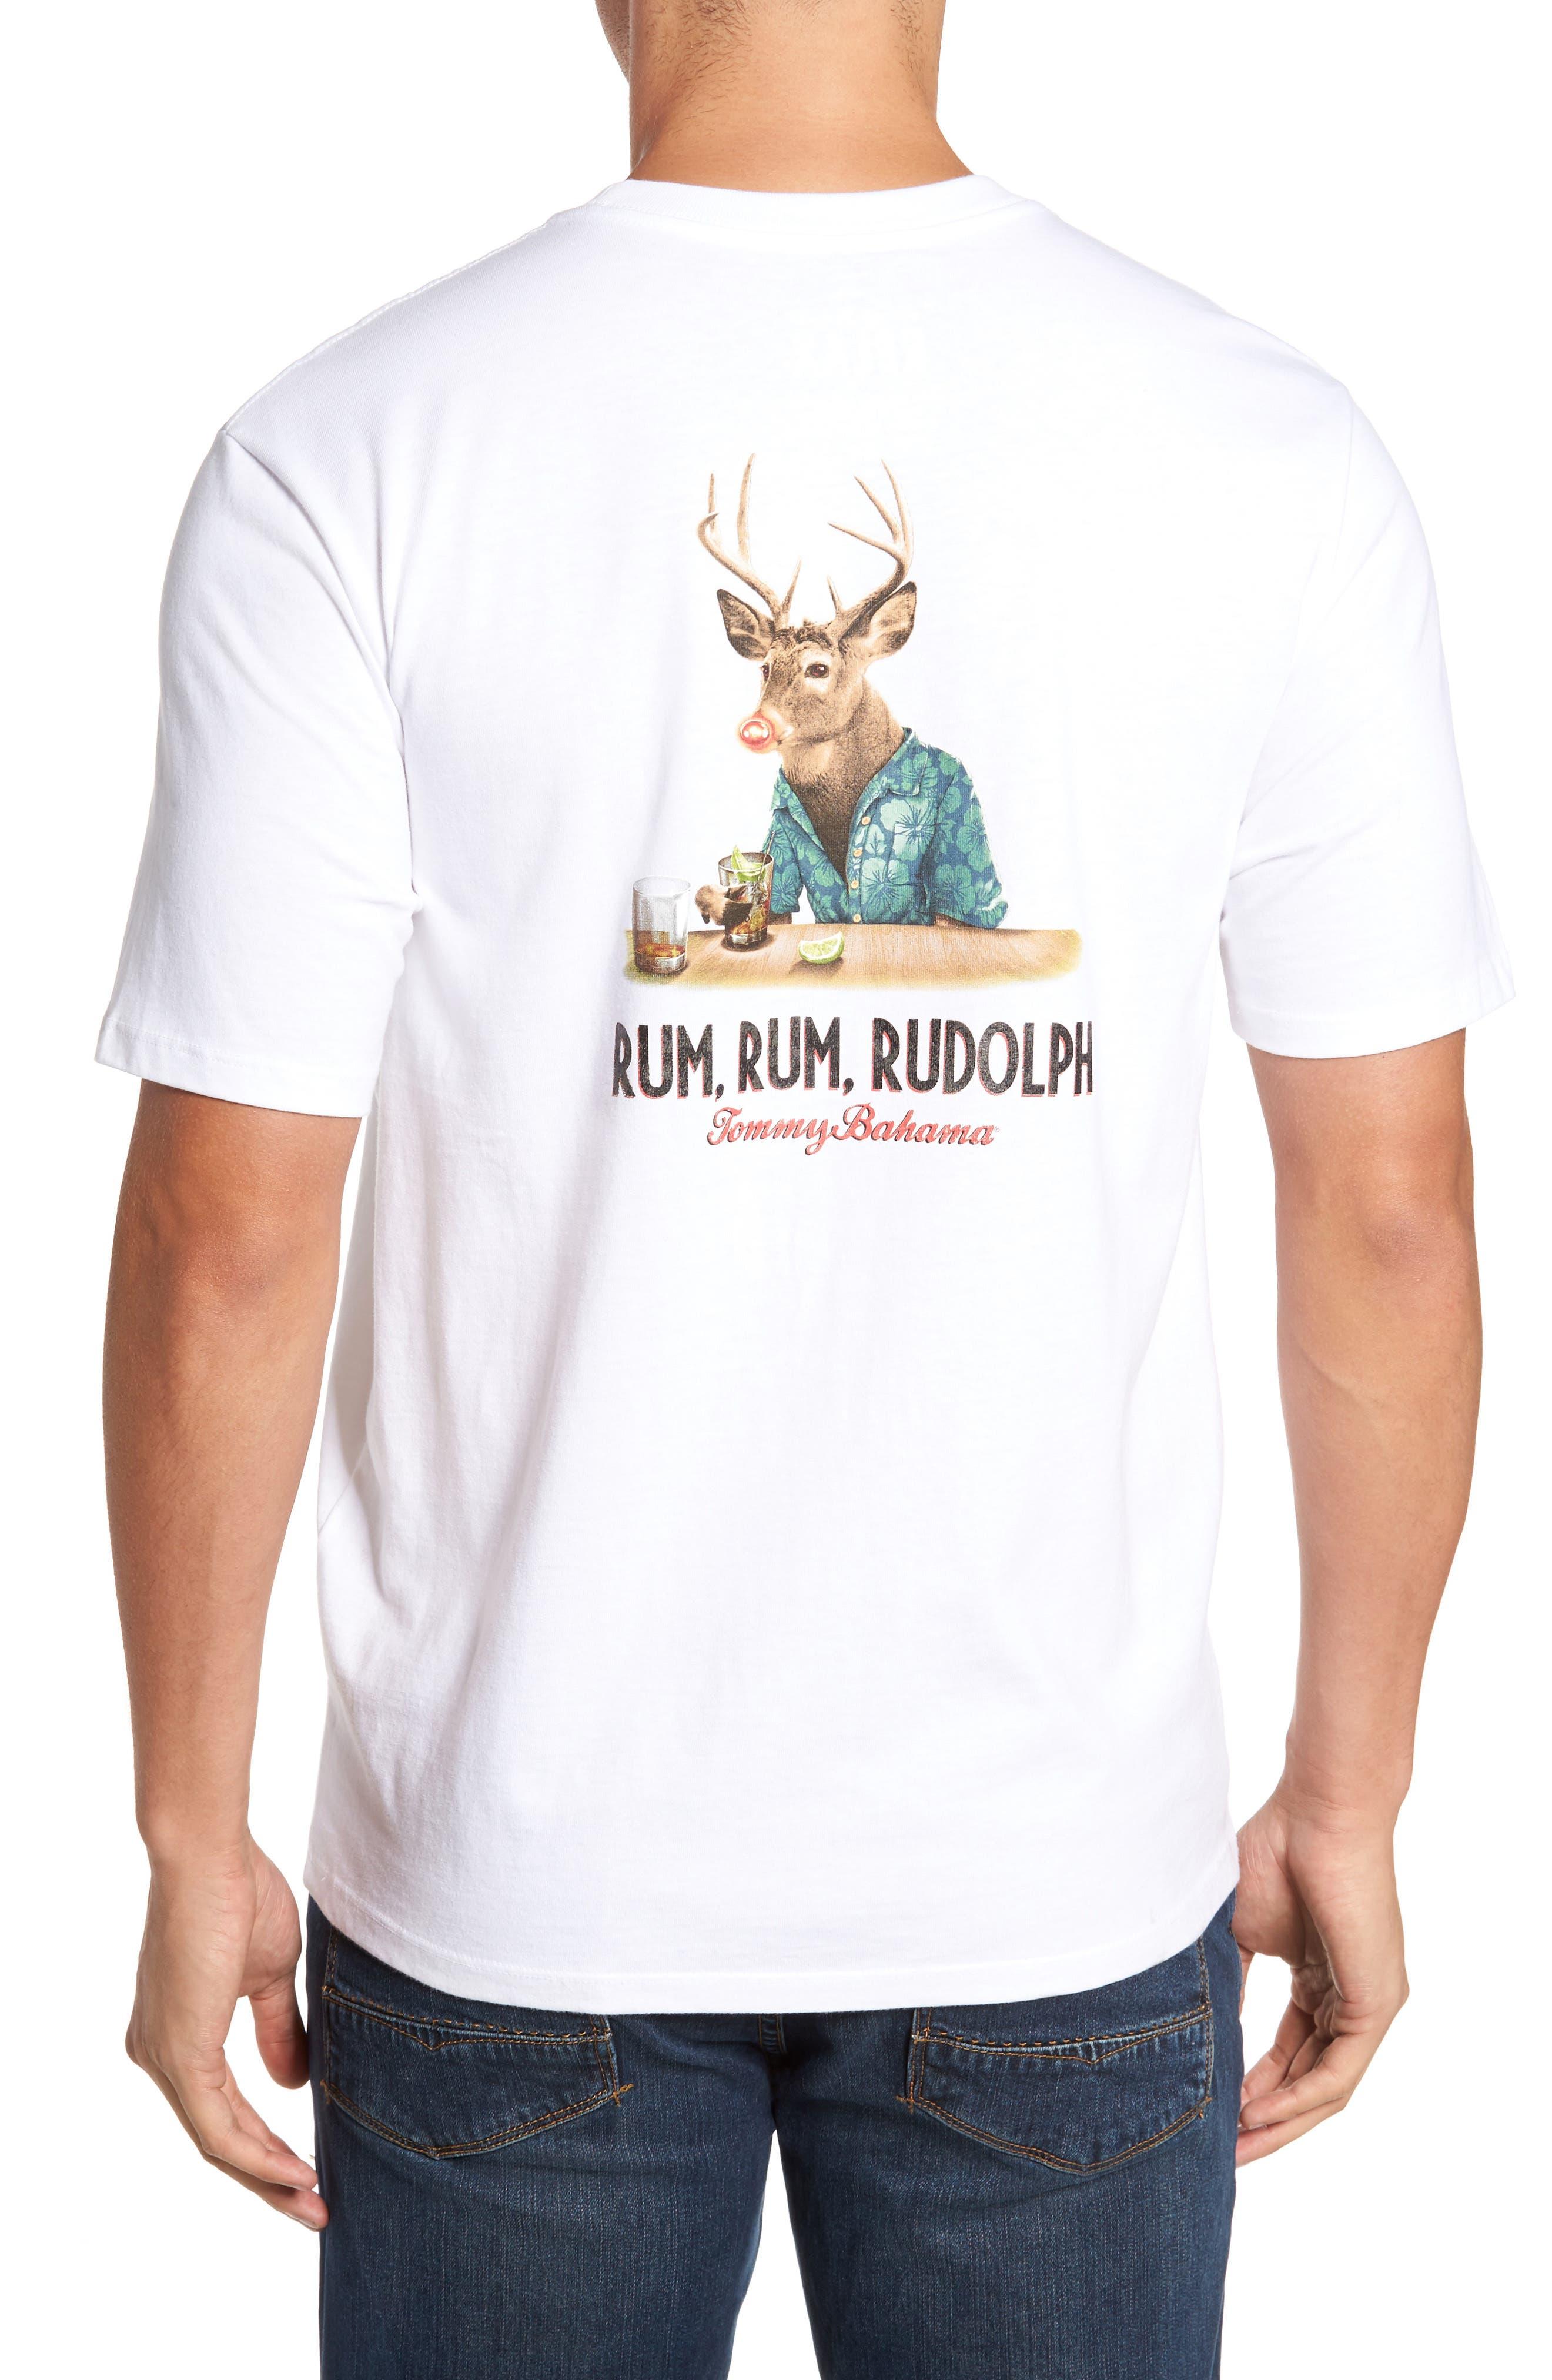 Rum Rum Rudolph T-Shirt,                             Alternate thumbnail 2, color,